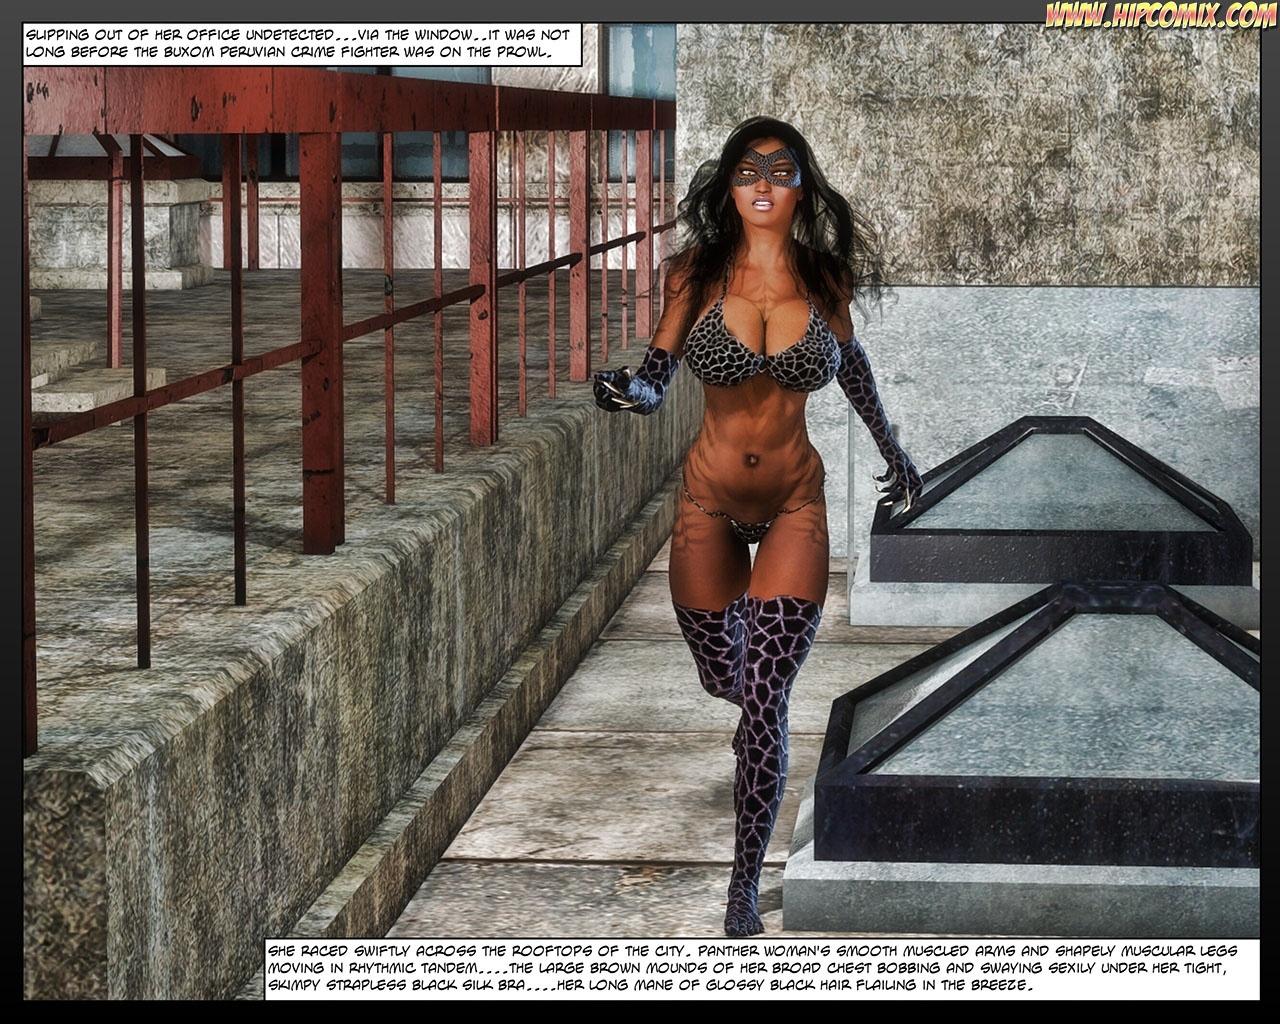 Panther-Girl-20 2 free sex comic